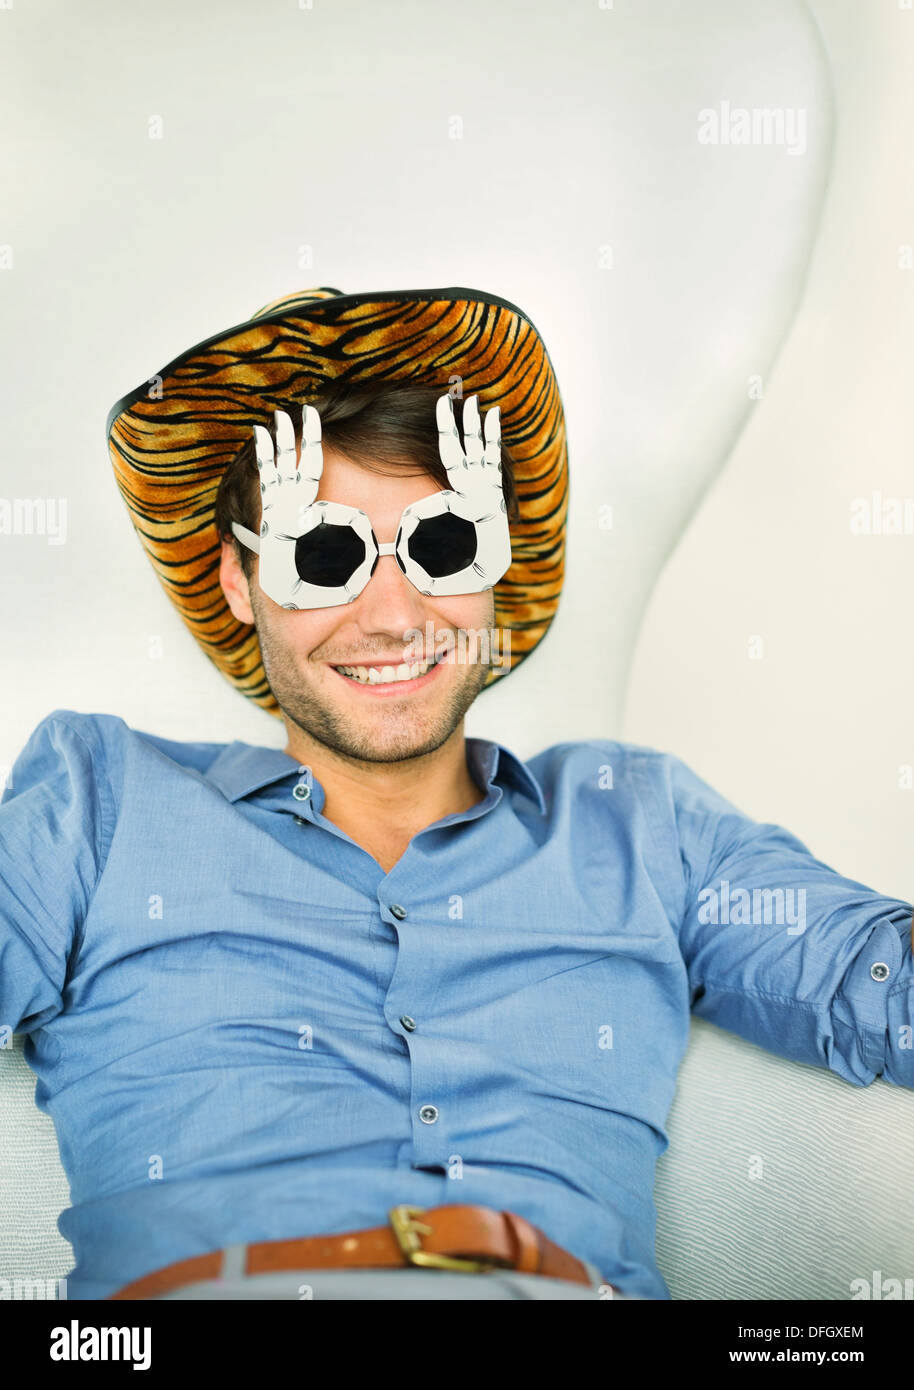 Hombre sonriendo portando gafas tonto Imagen De Stock